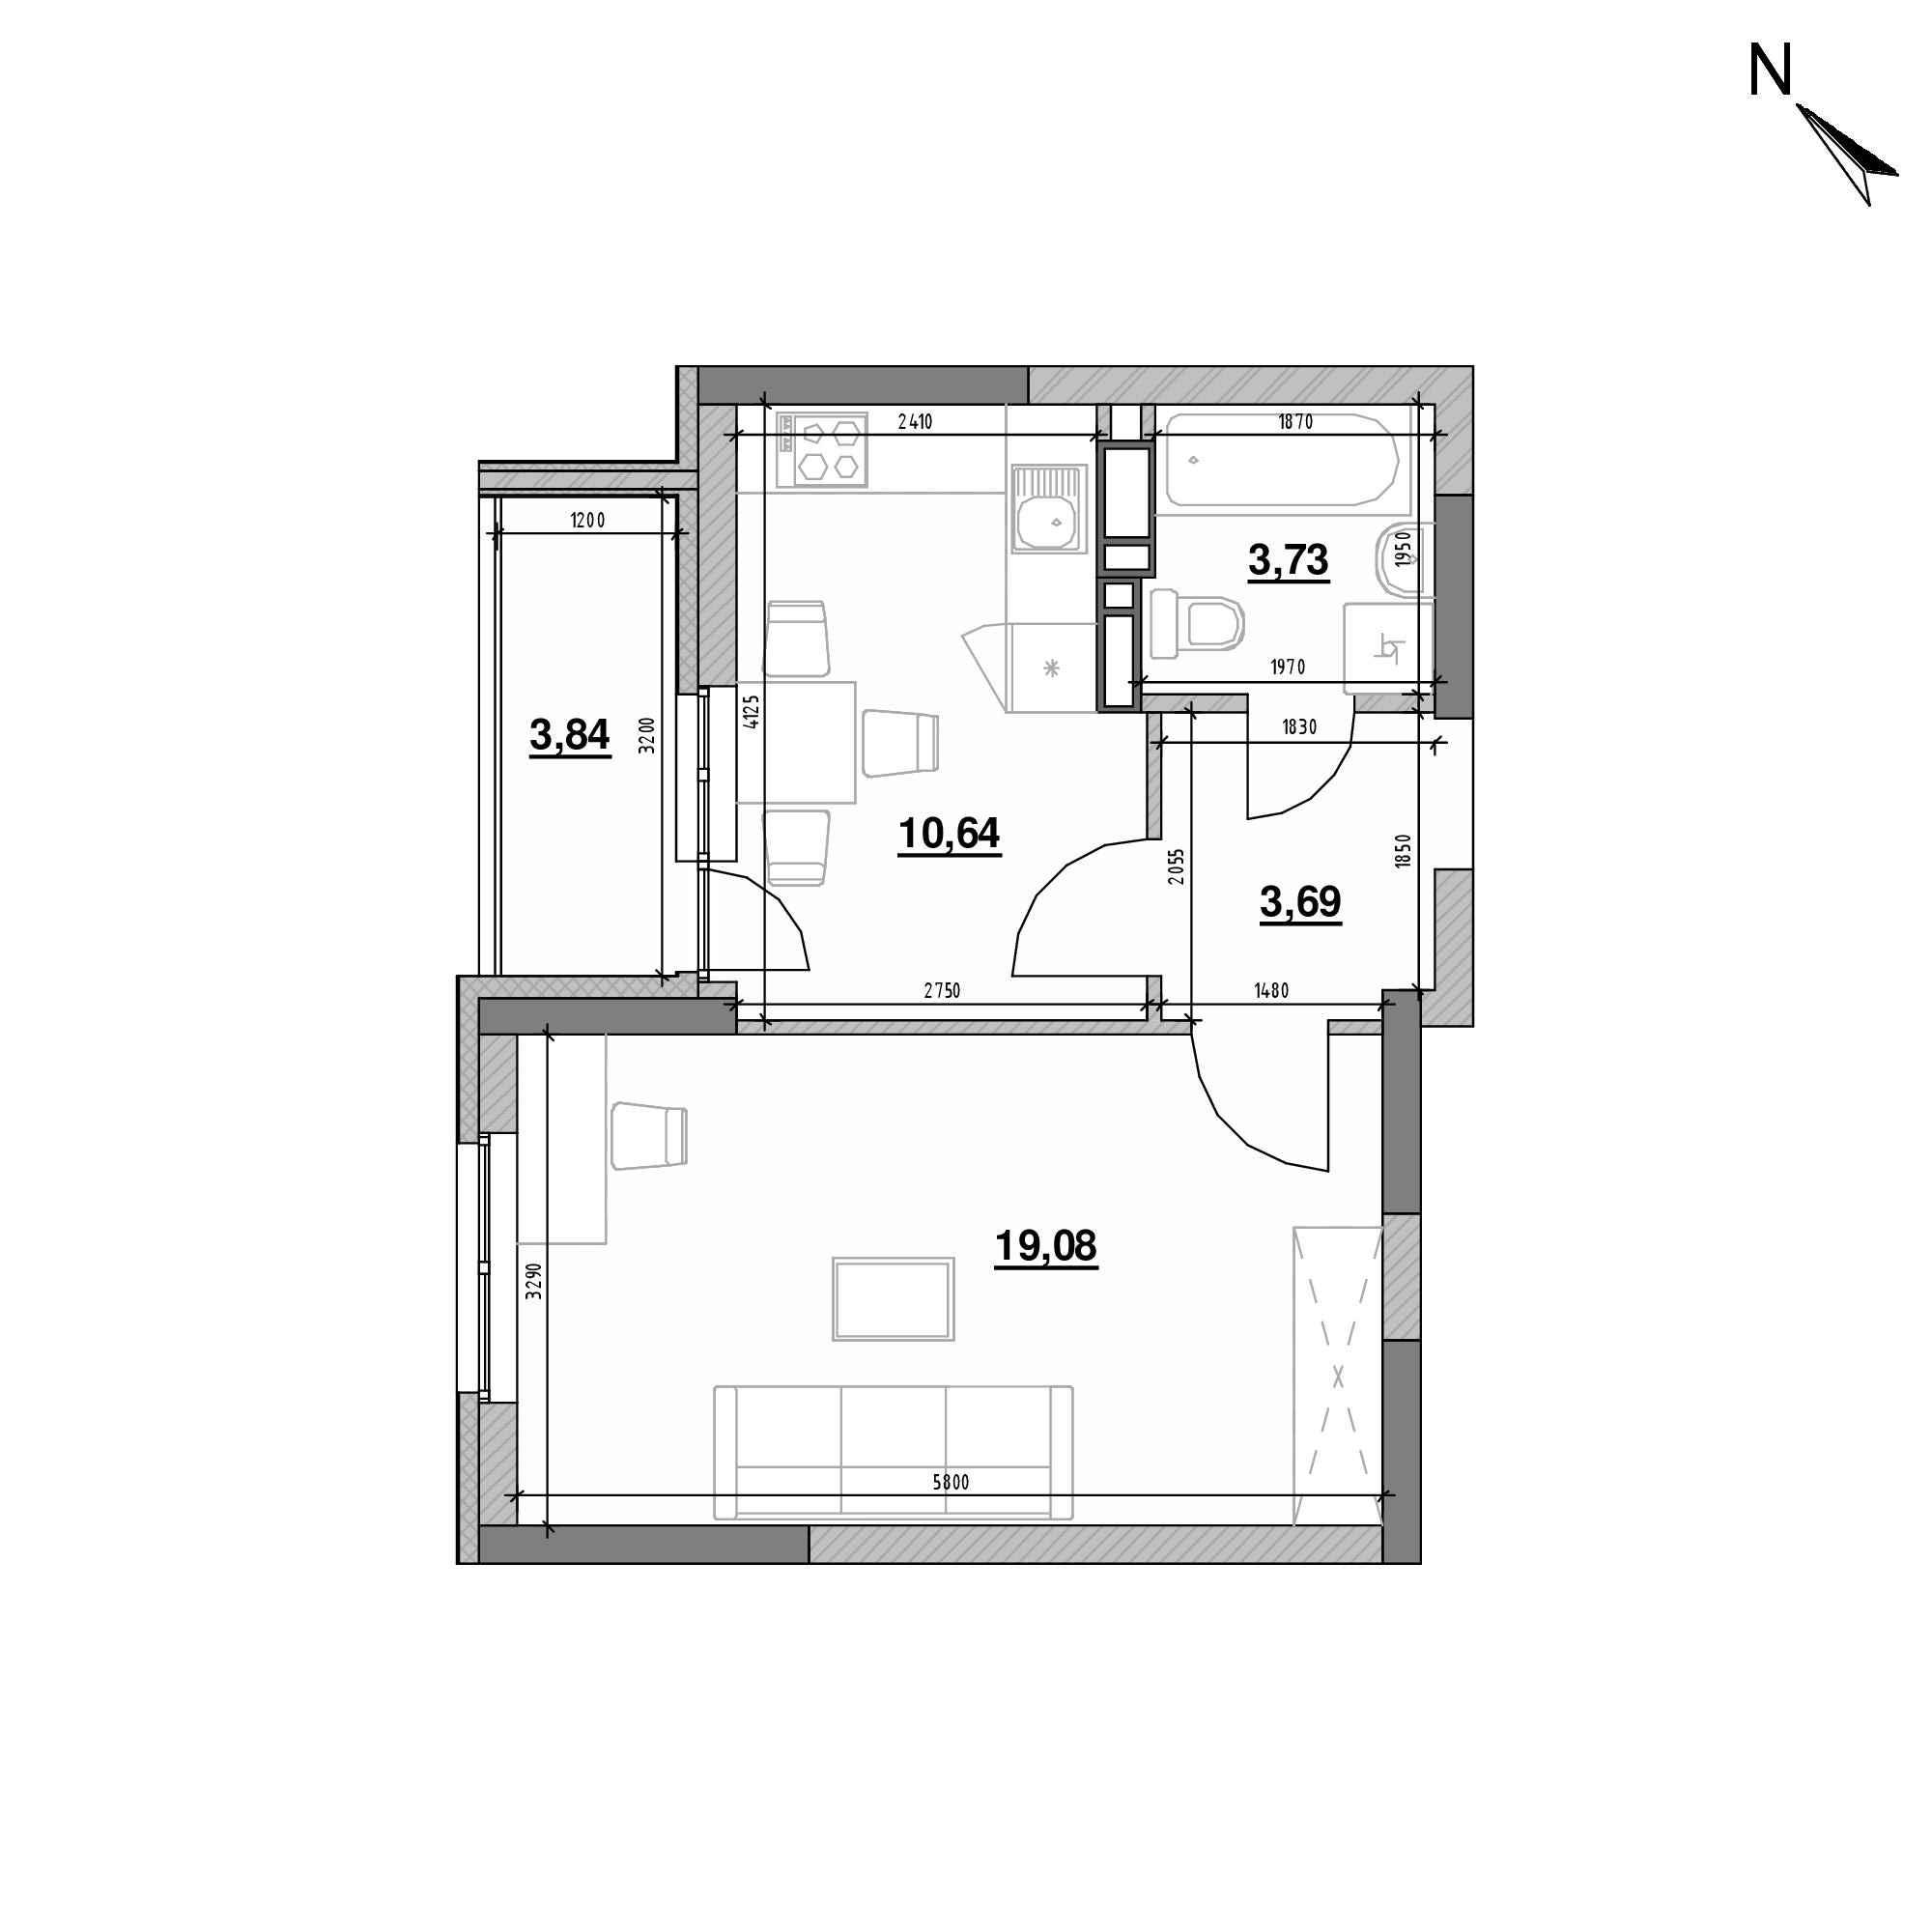 ЖК Оk'Land: планування 1-кімнатної квартири, №115, 40.98 м<sup>2</sup>